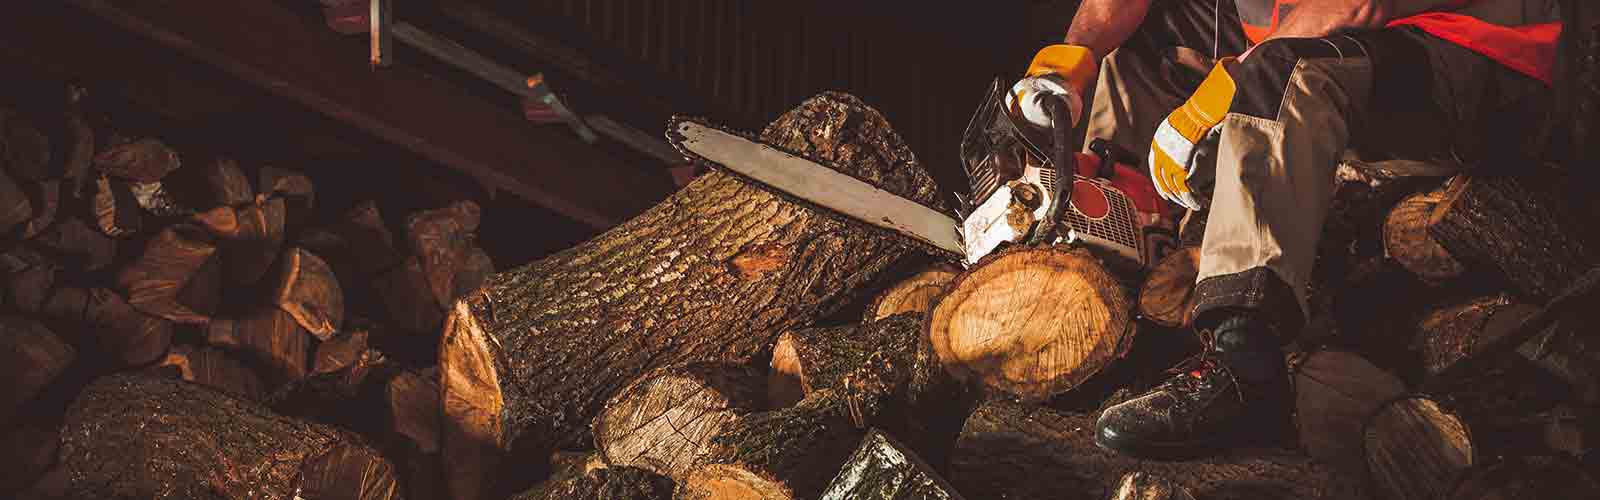 Baumpflege Rohrbeck - Holz schneiden